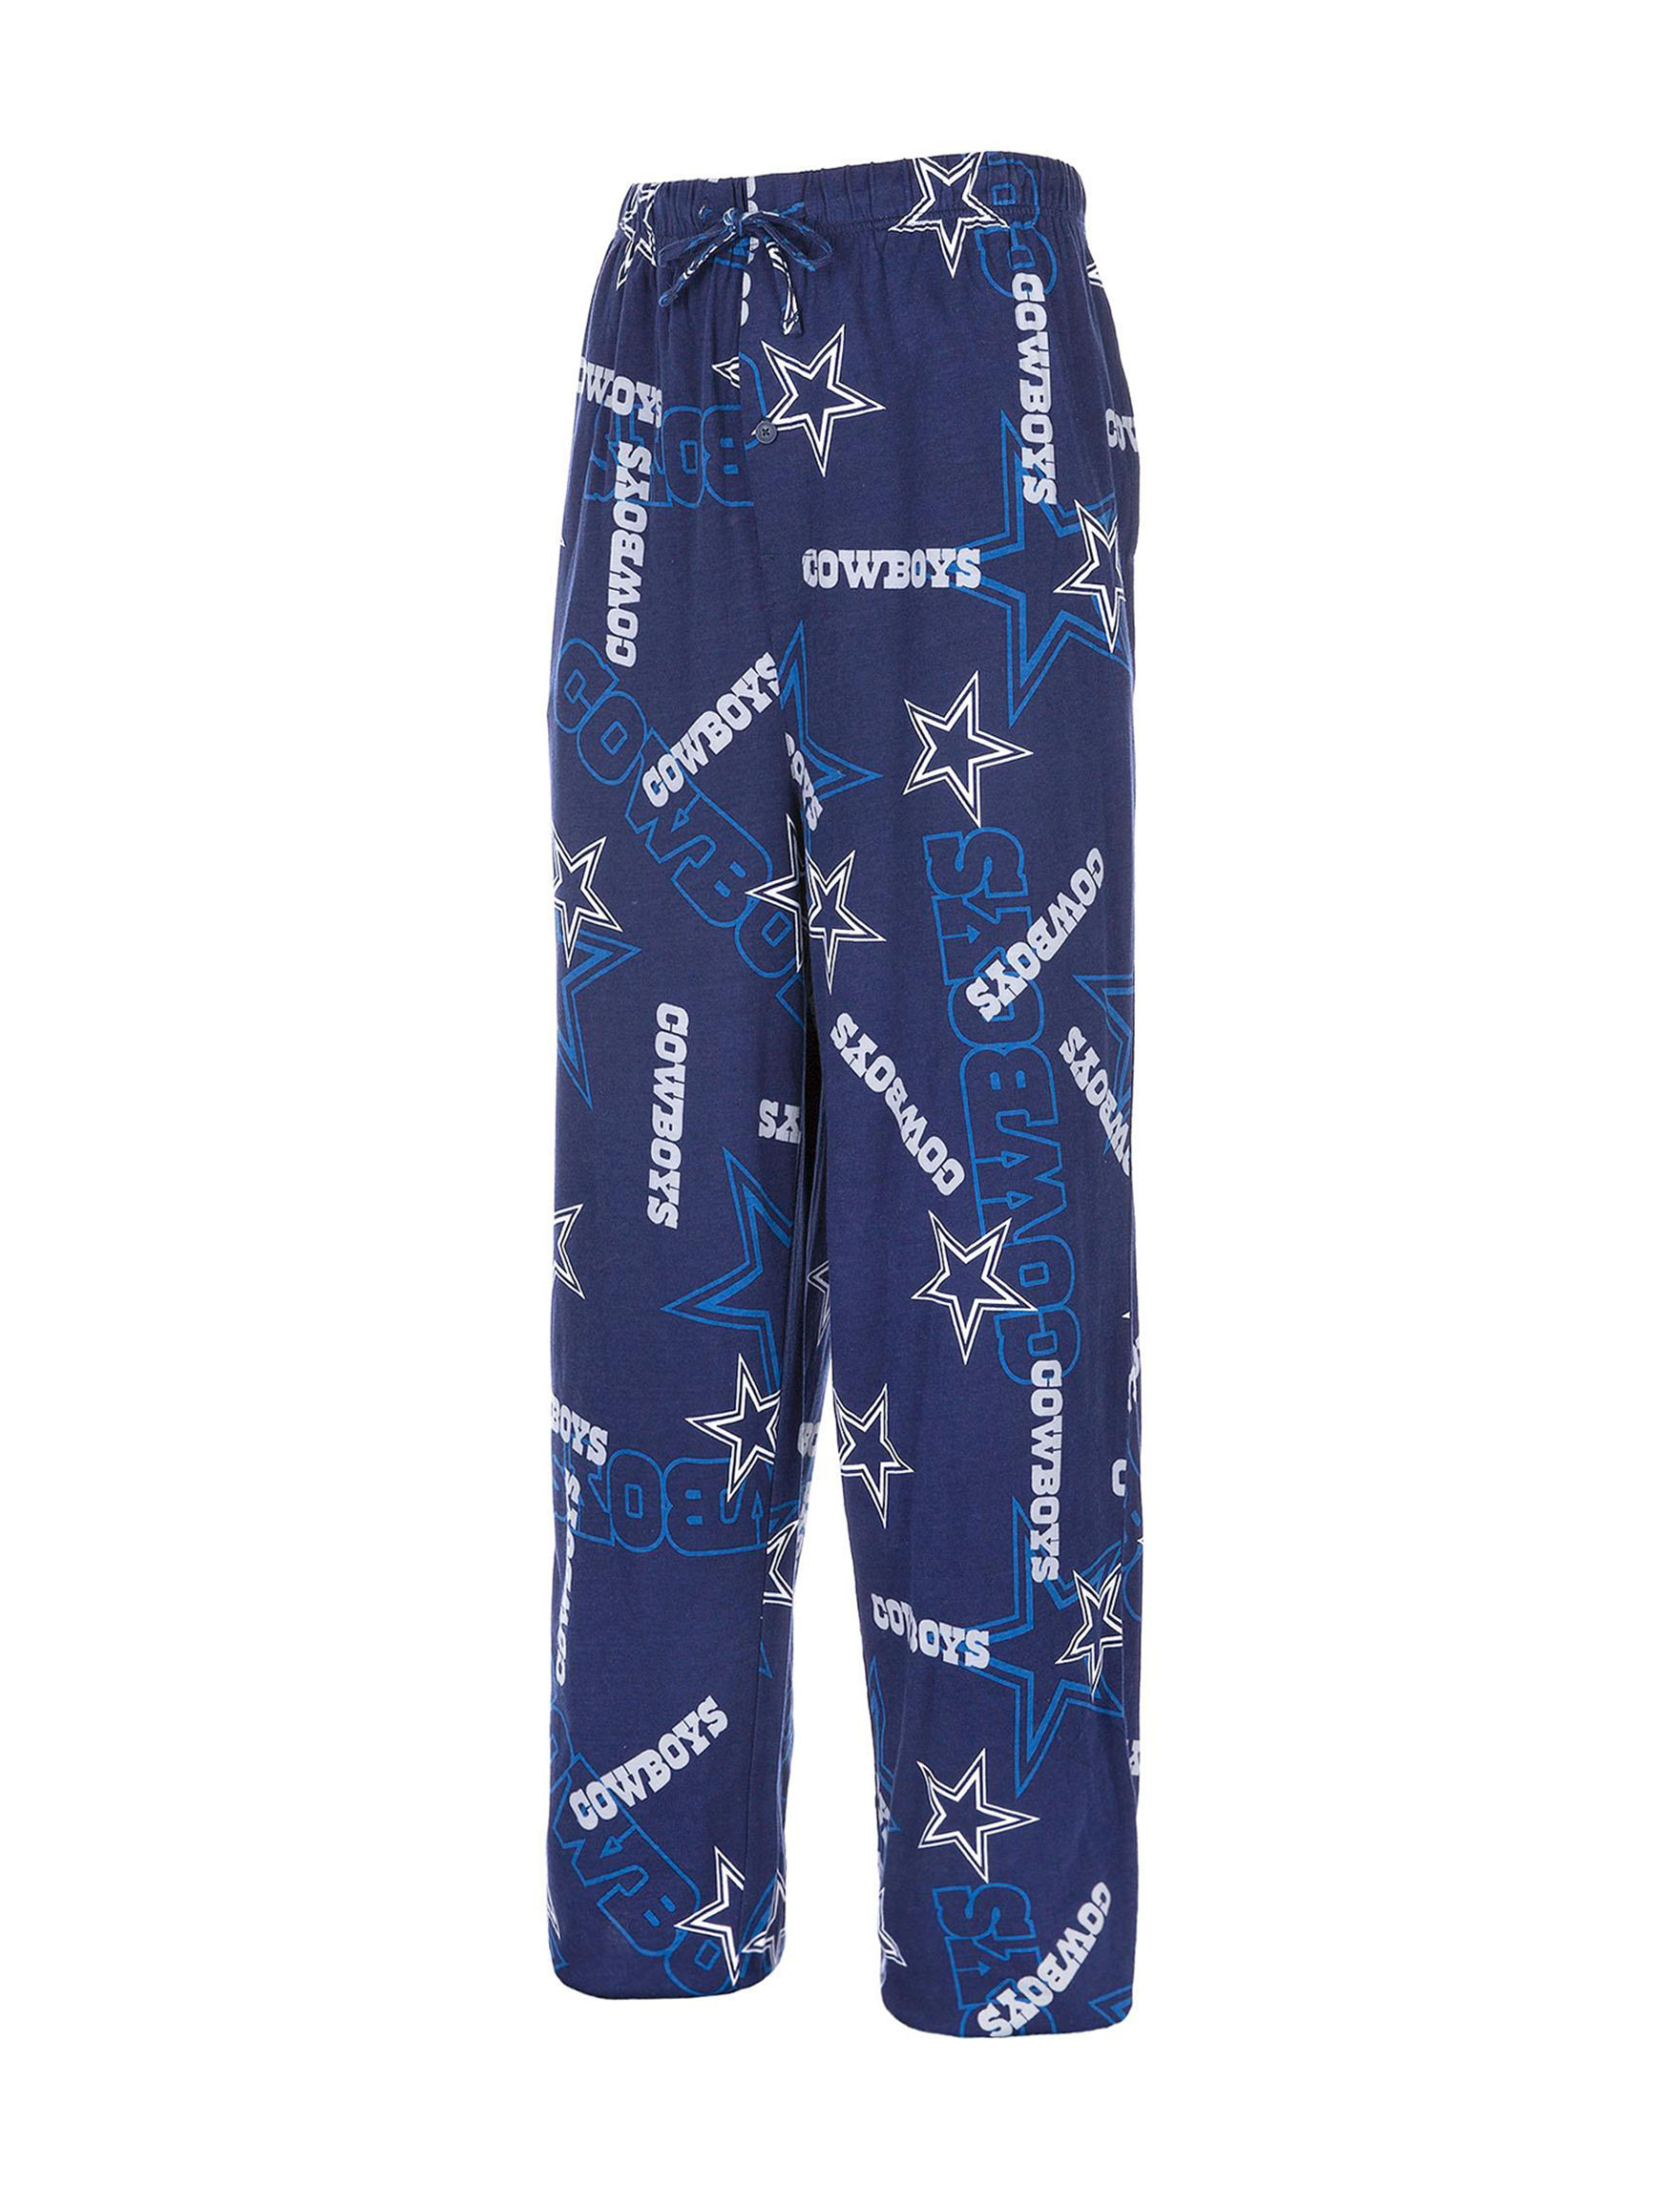 NFL Navy Pajama Bottoms